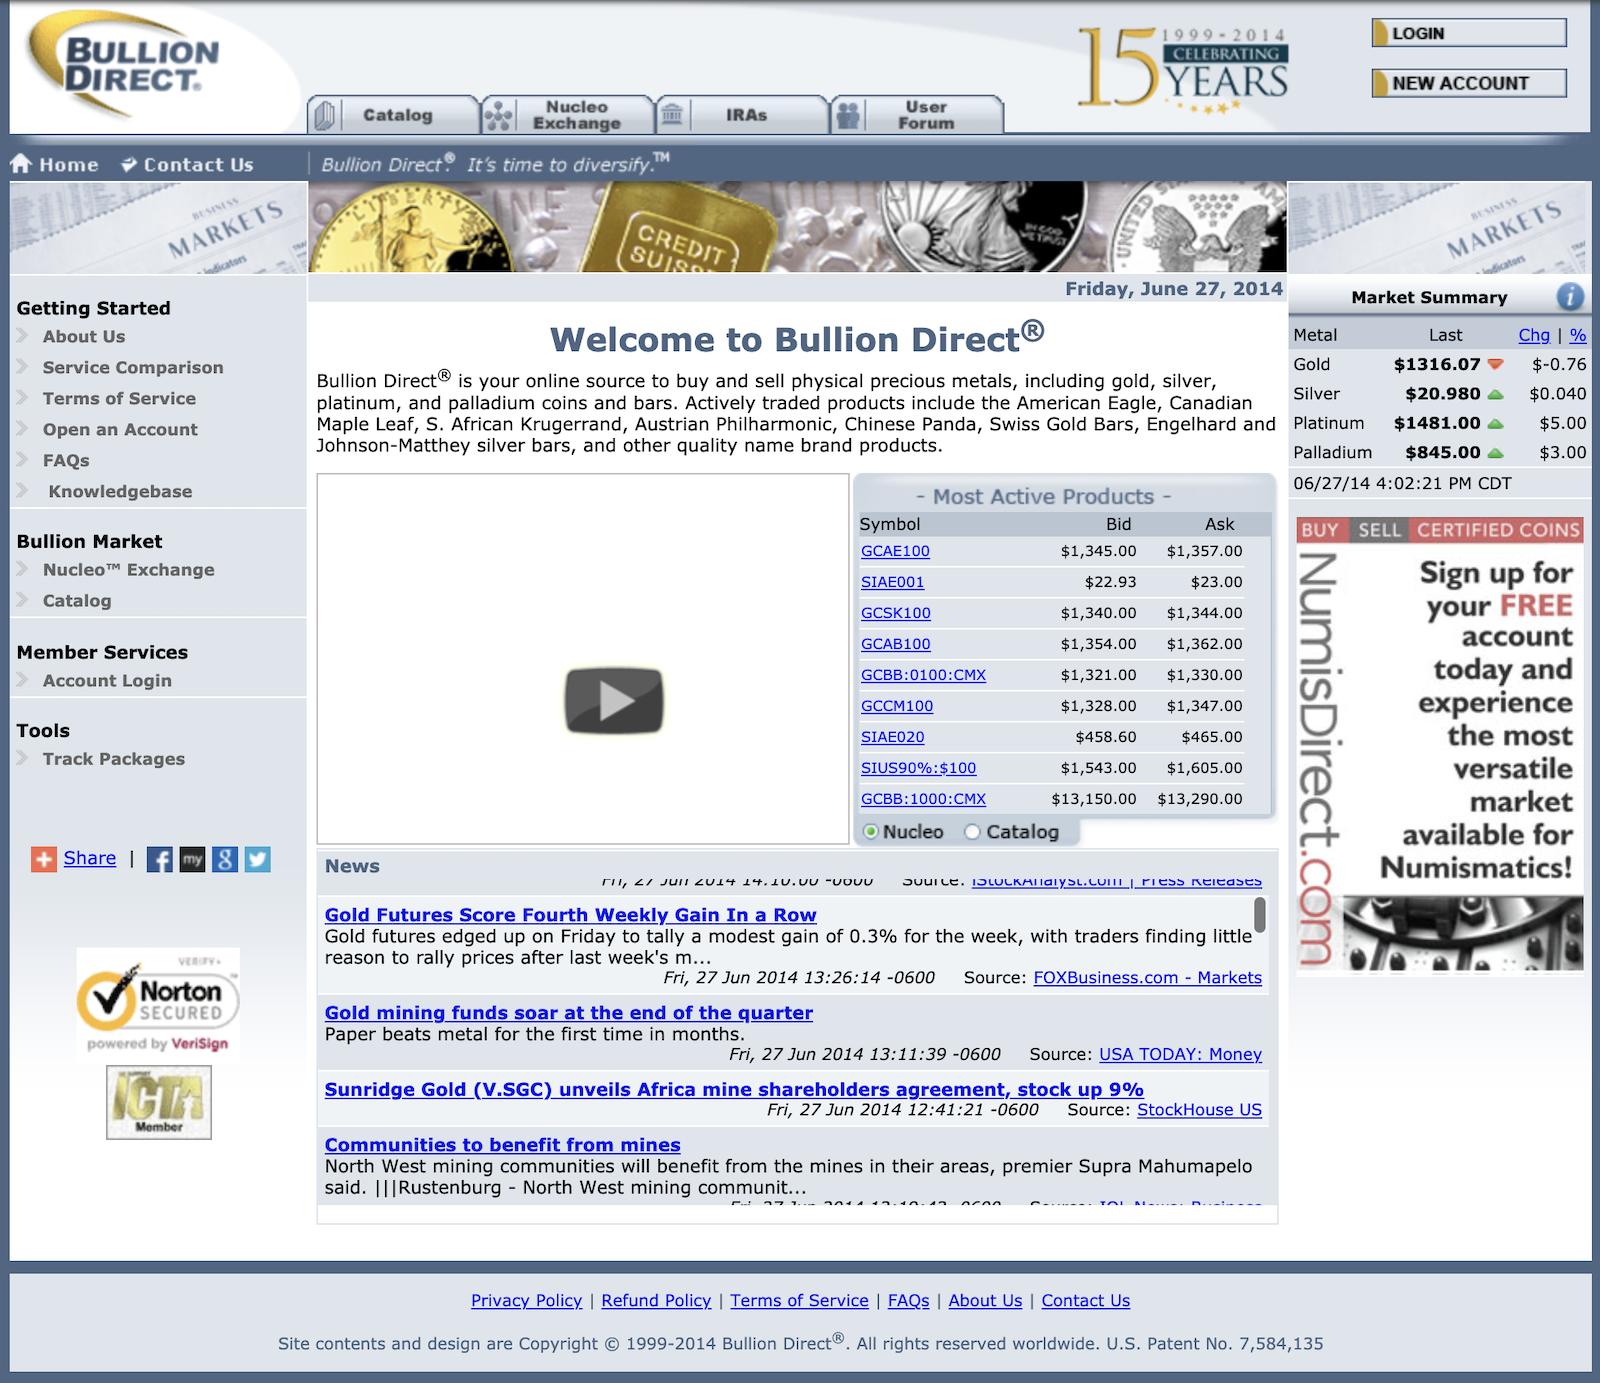 BullionDirect Website 2014